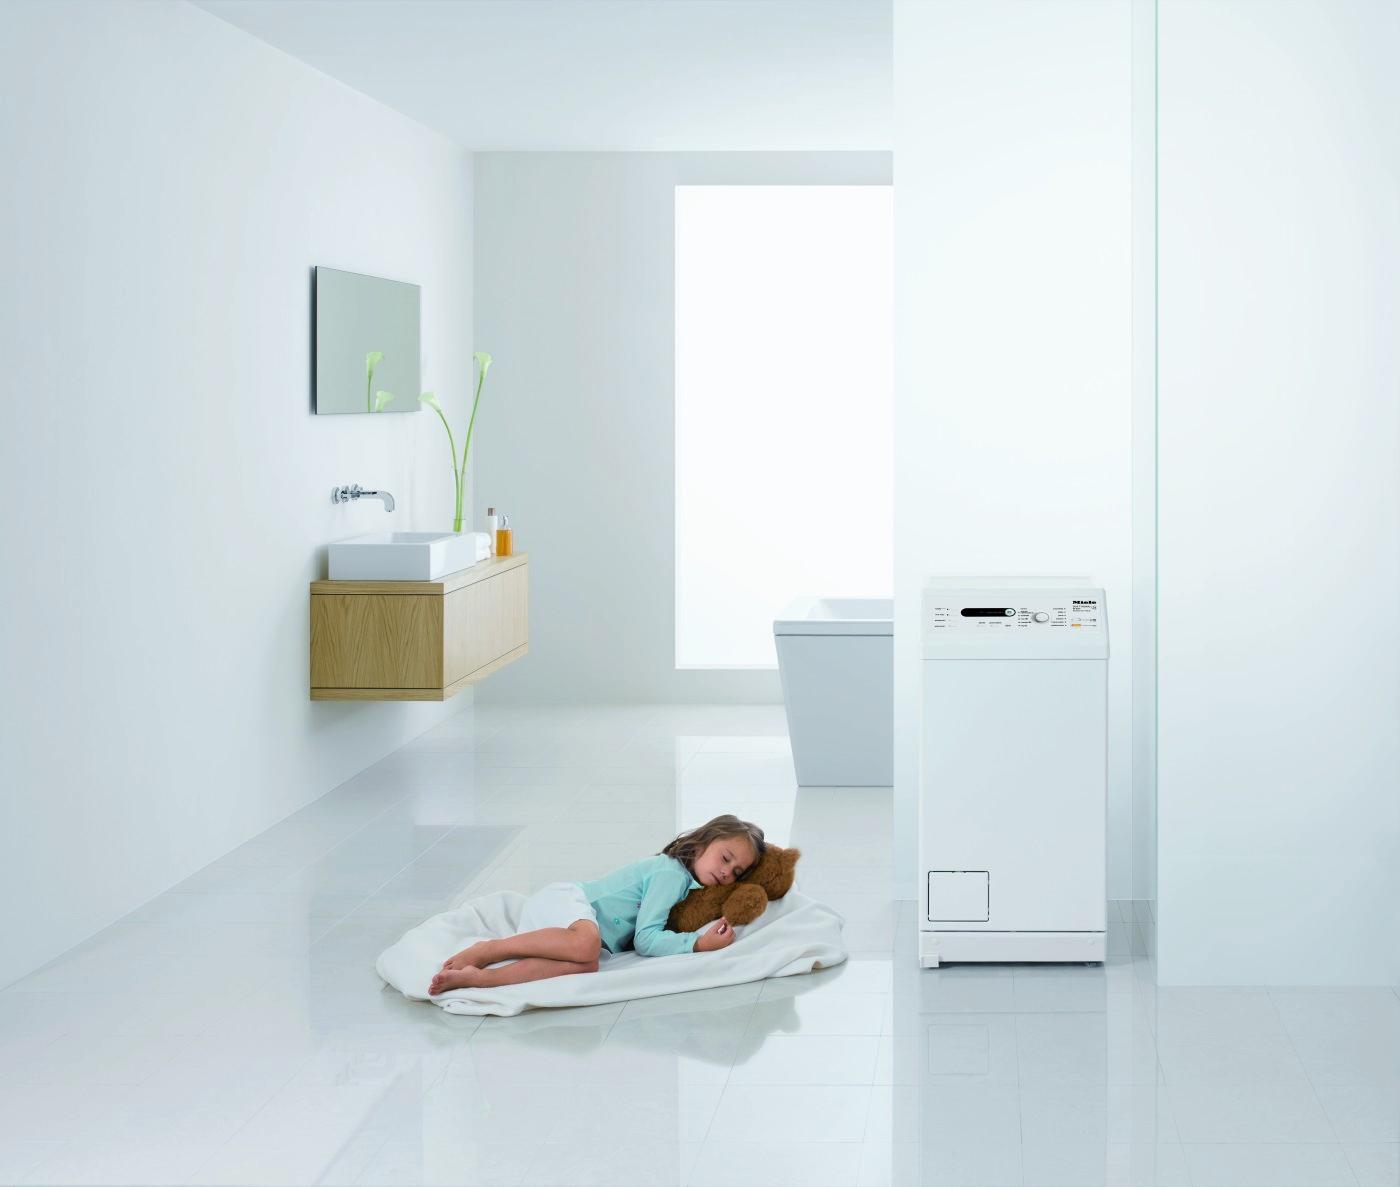 miele waschmaschine toplader bewusst haushalten. Black Bedroom Furniture Sets. Home Design Ideas